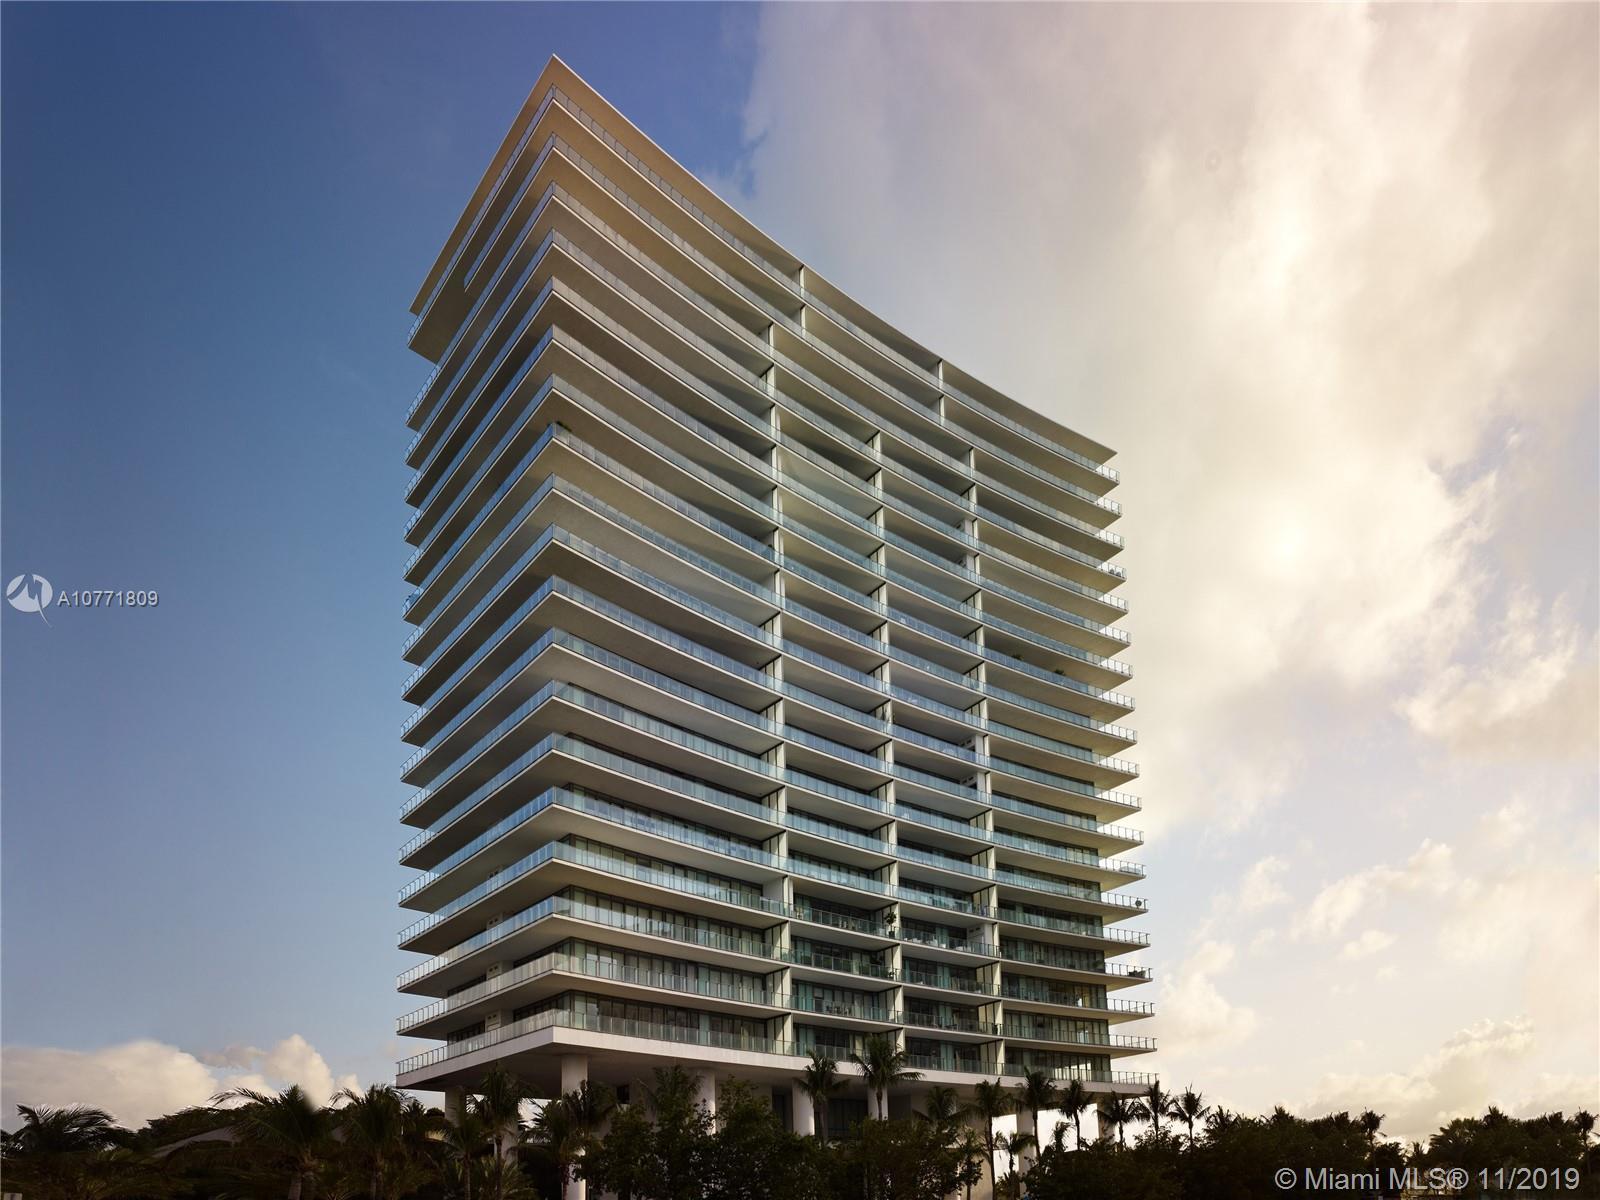 Photo of Apogee South Beach Apt 804